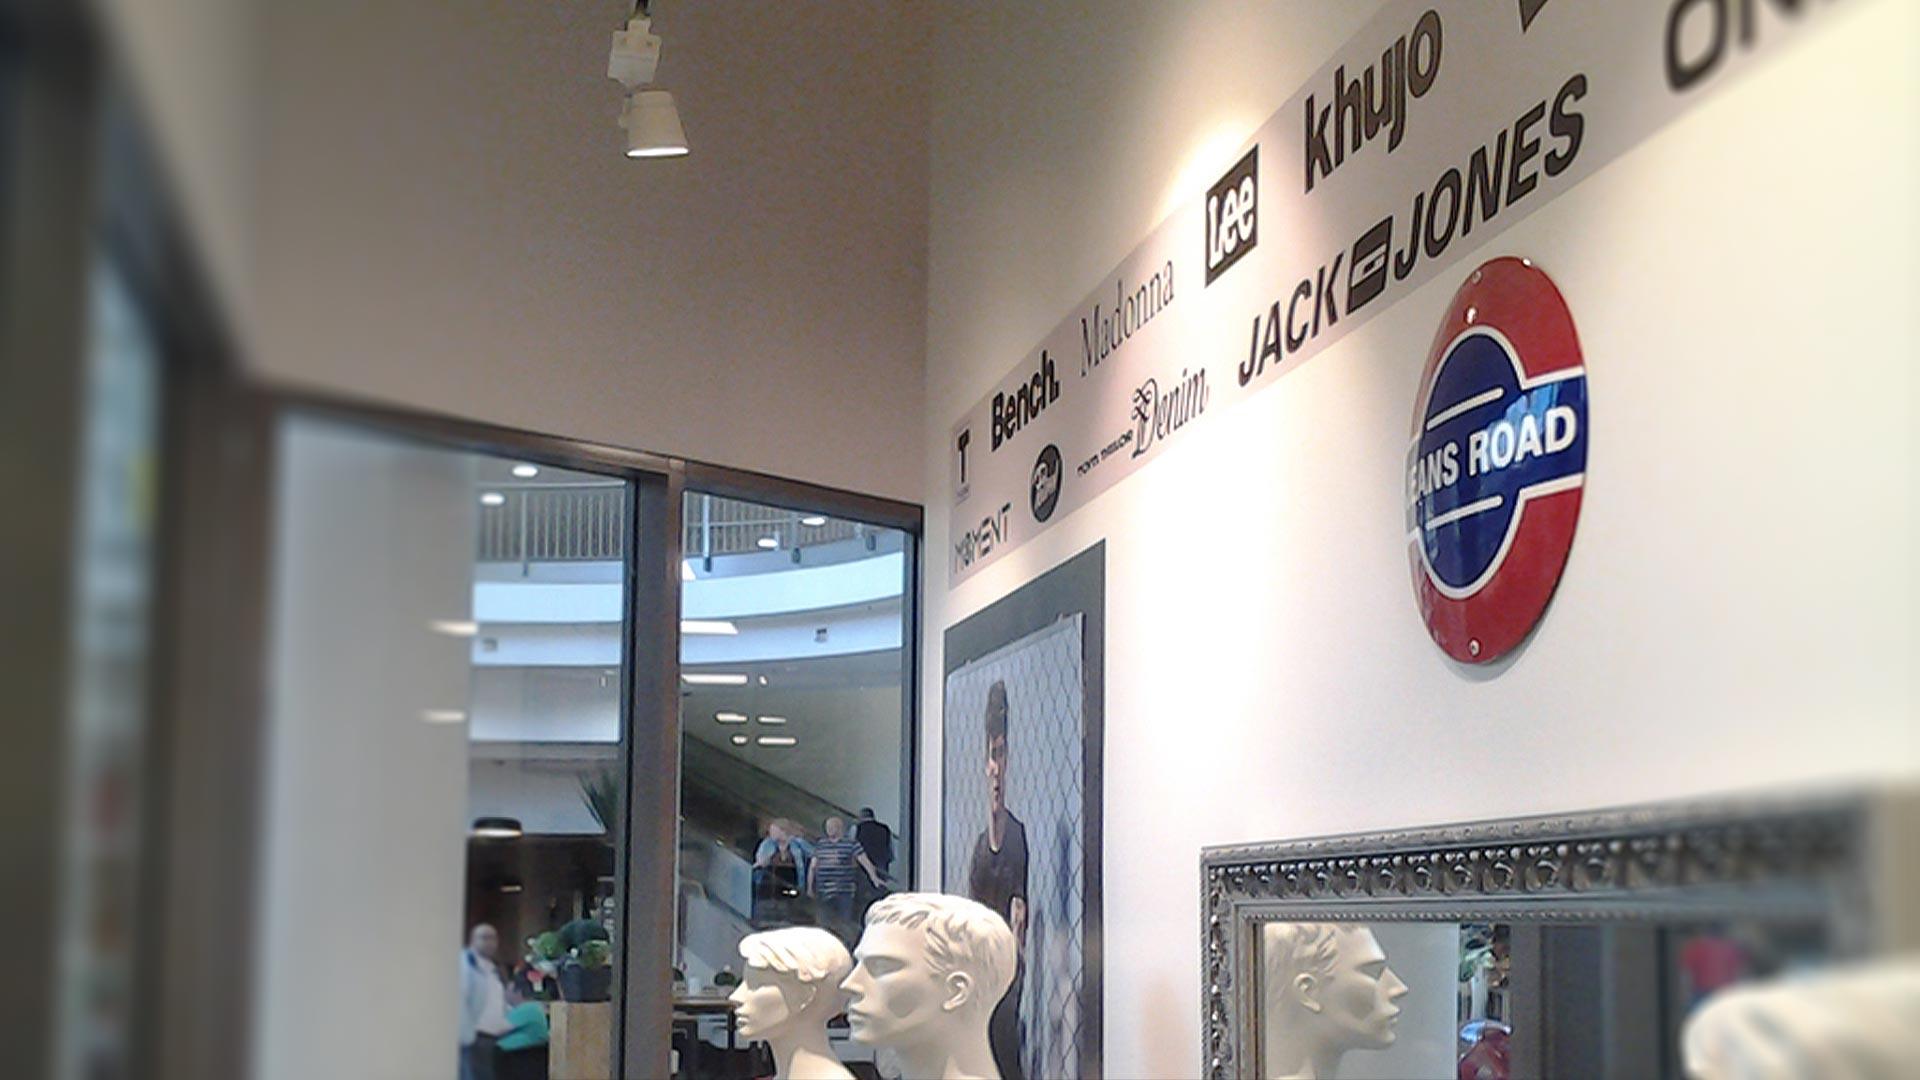 Jeans Road Shop, Kehl